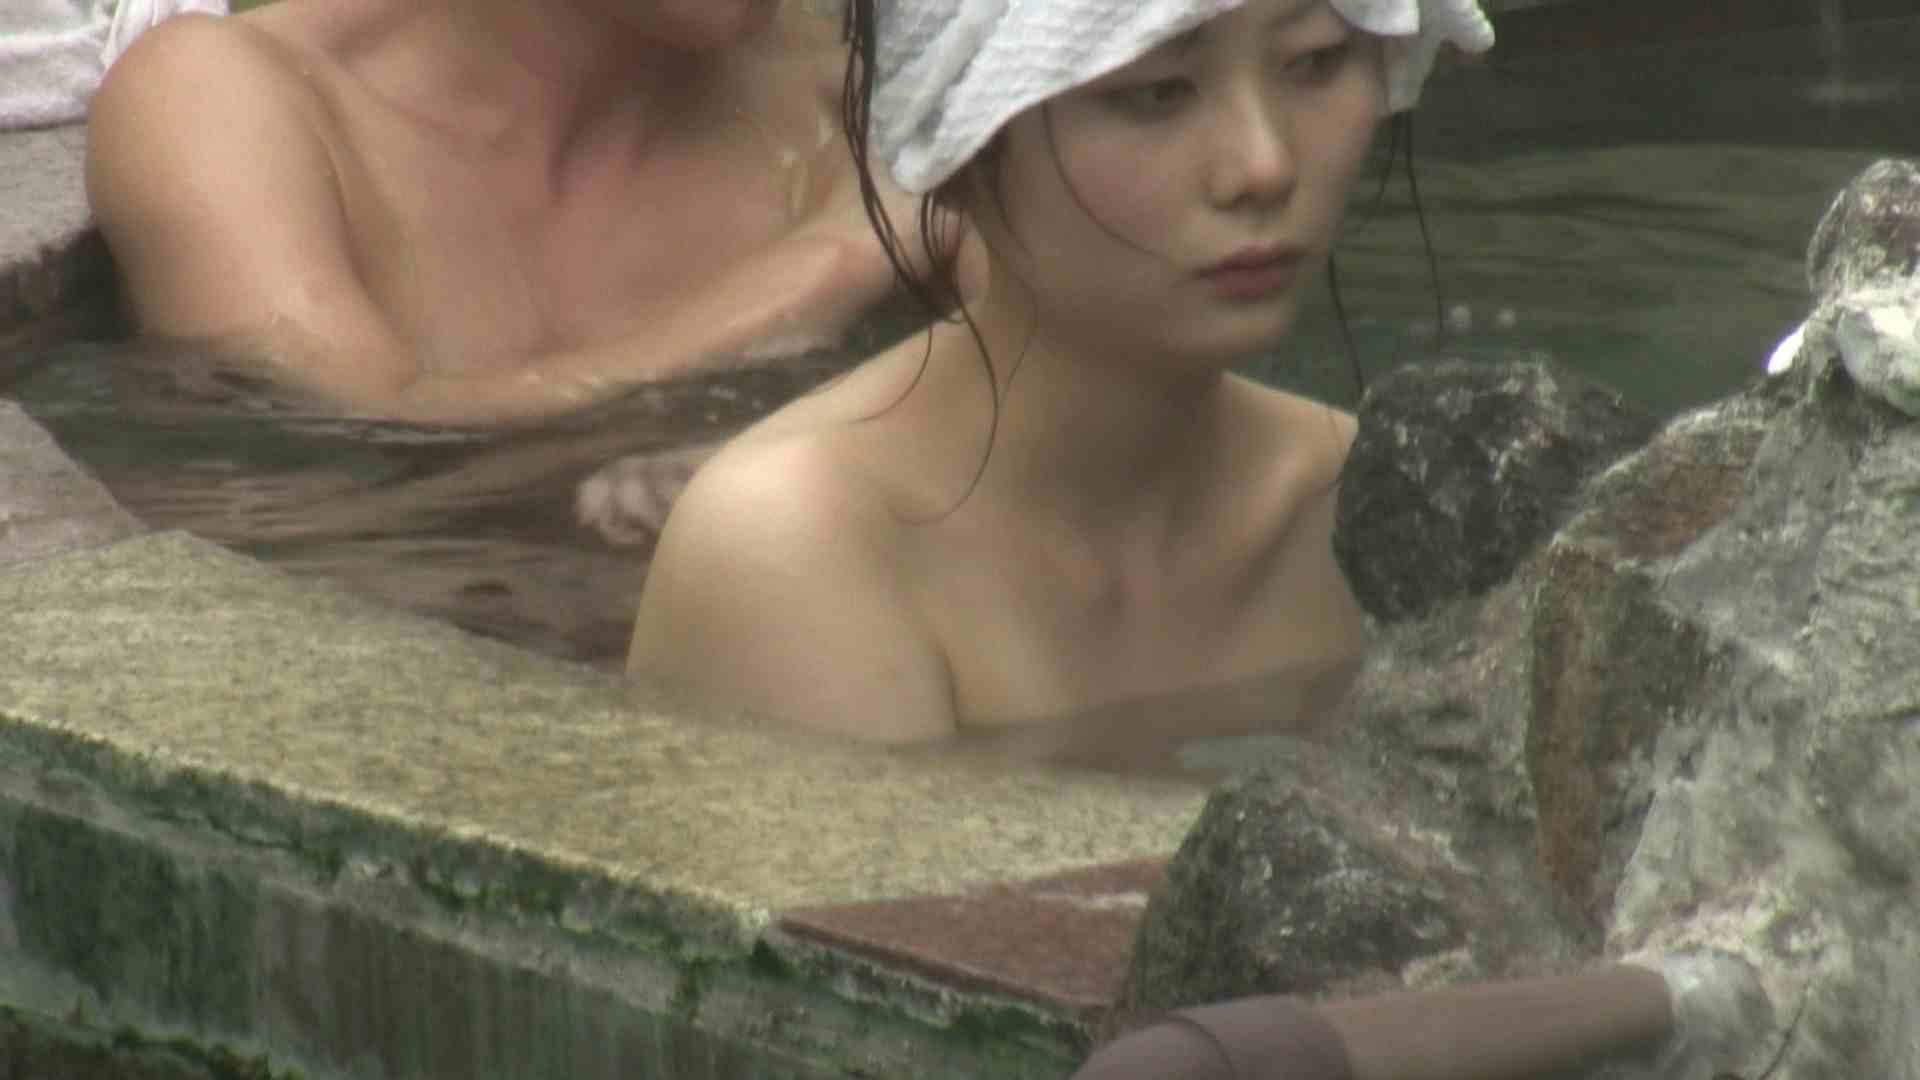 Aquaな露天風呂Vol.147 HなOL | 露天  103pic 6